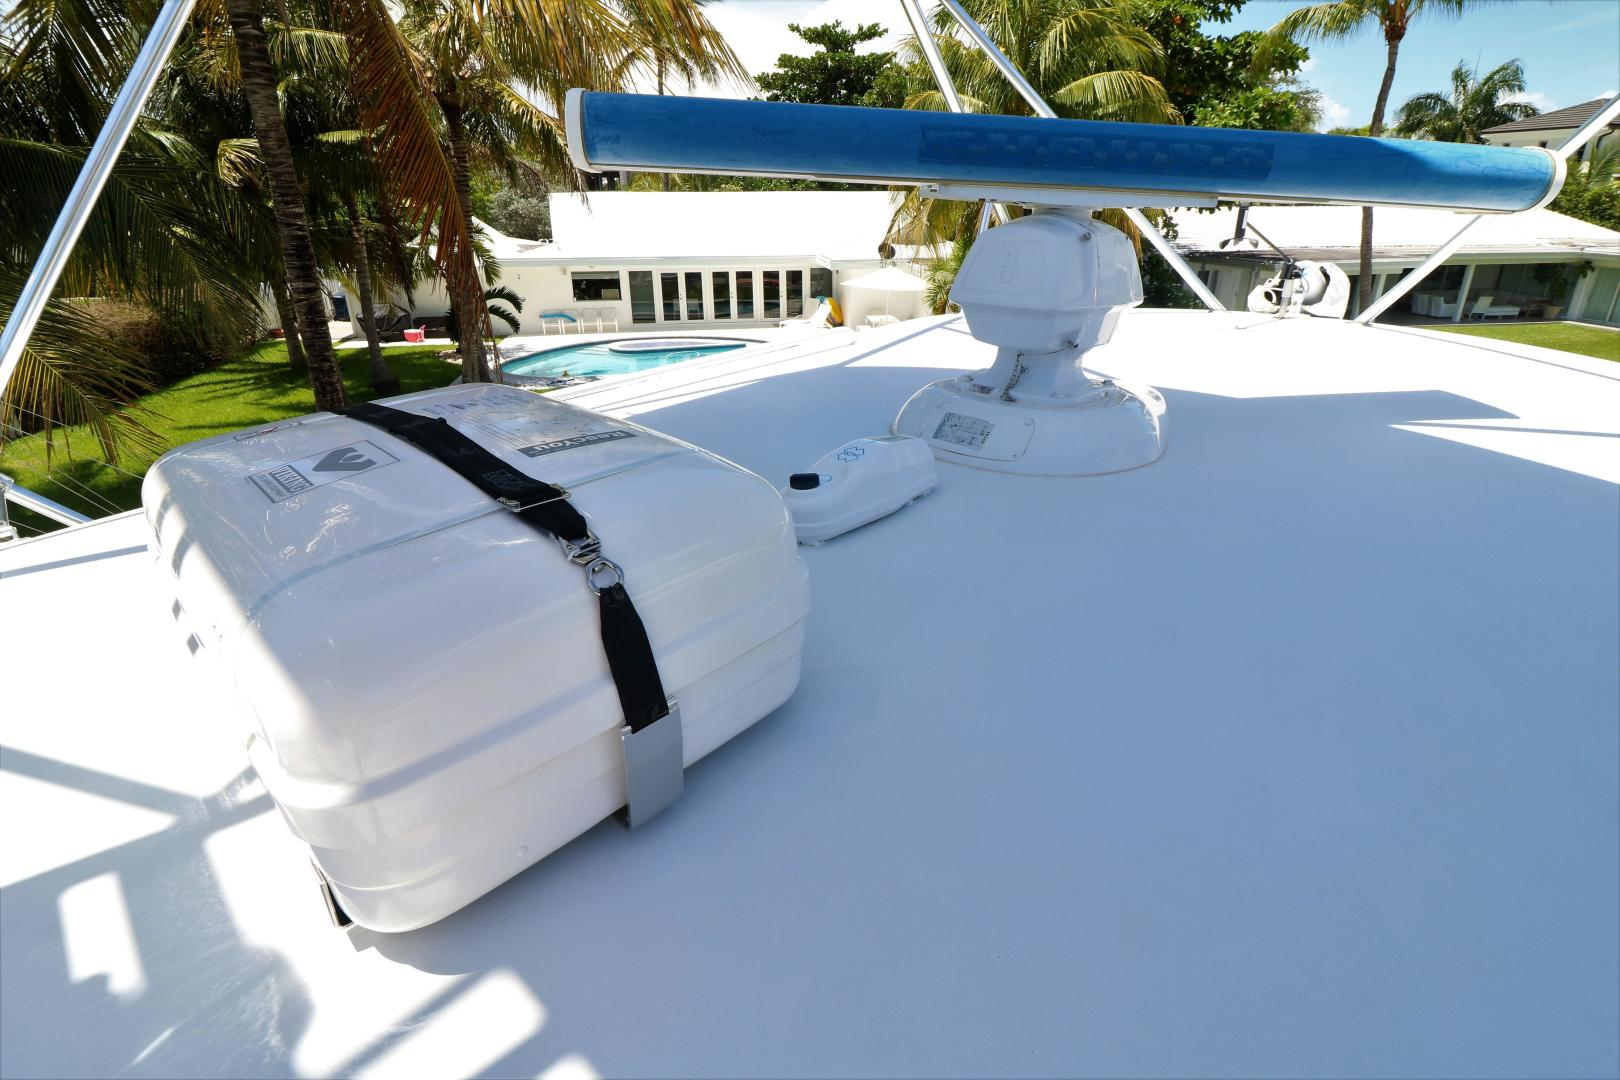 Hatteras-70 Convertible 2000 -Miami Beach-Florida-United States-556193   Thumbnail